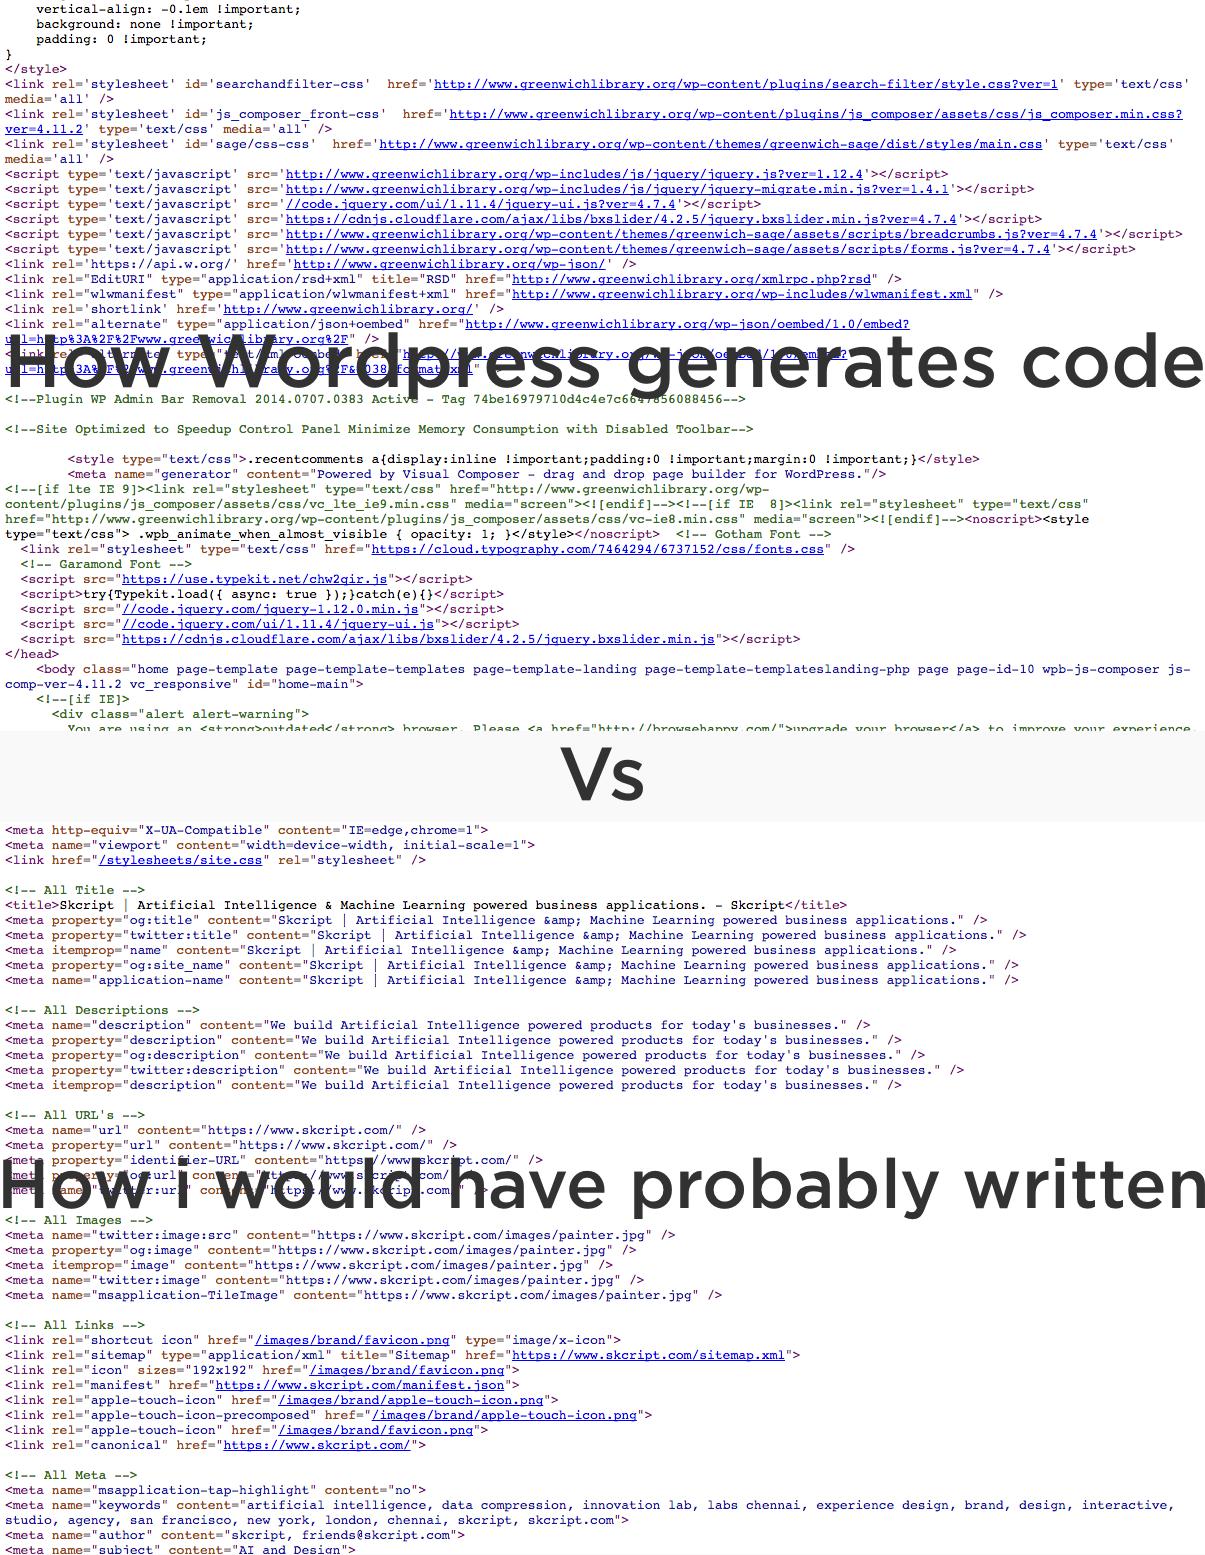 Wordpress code quality